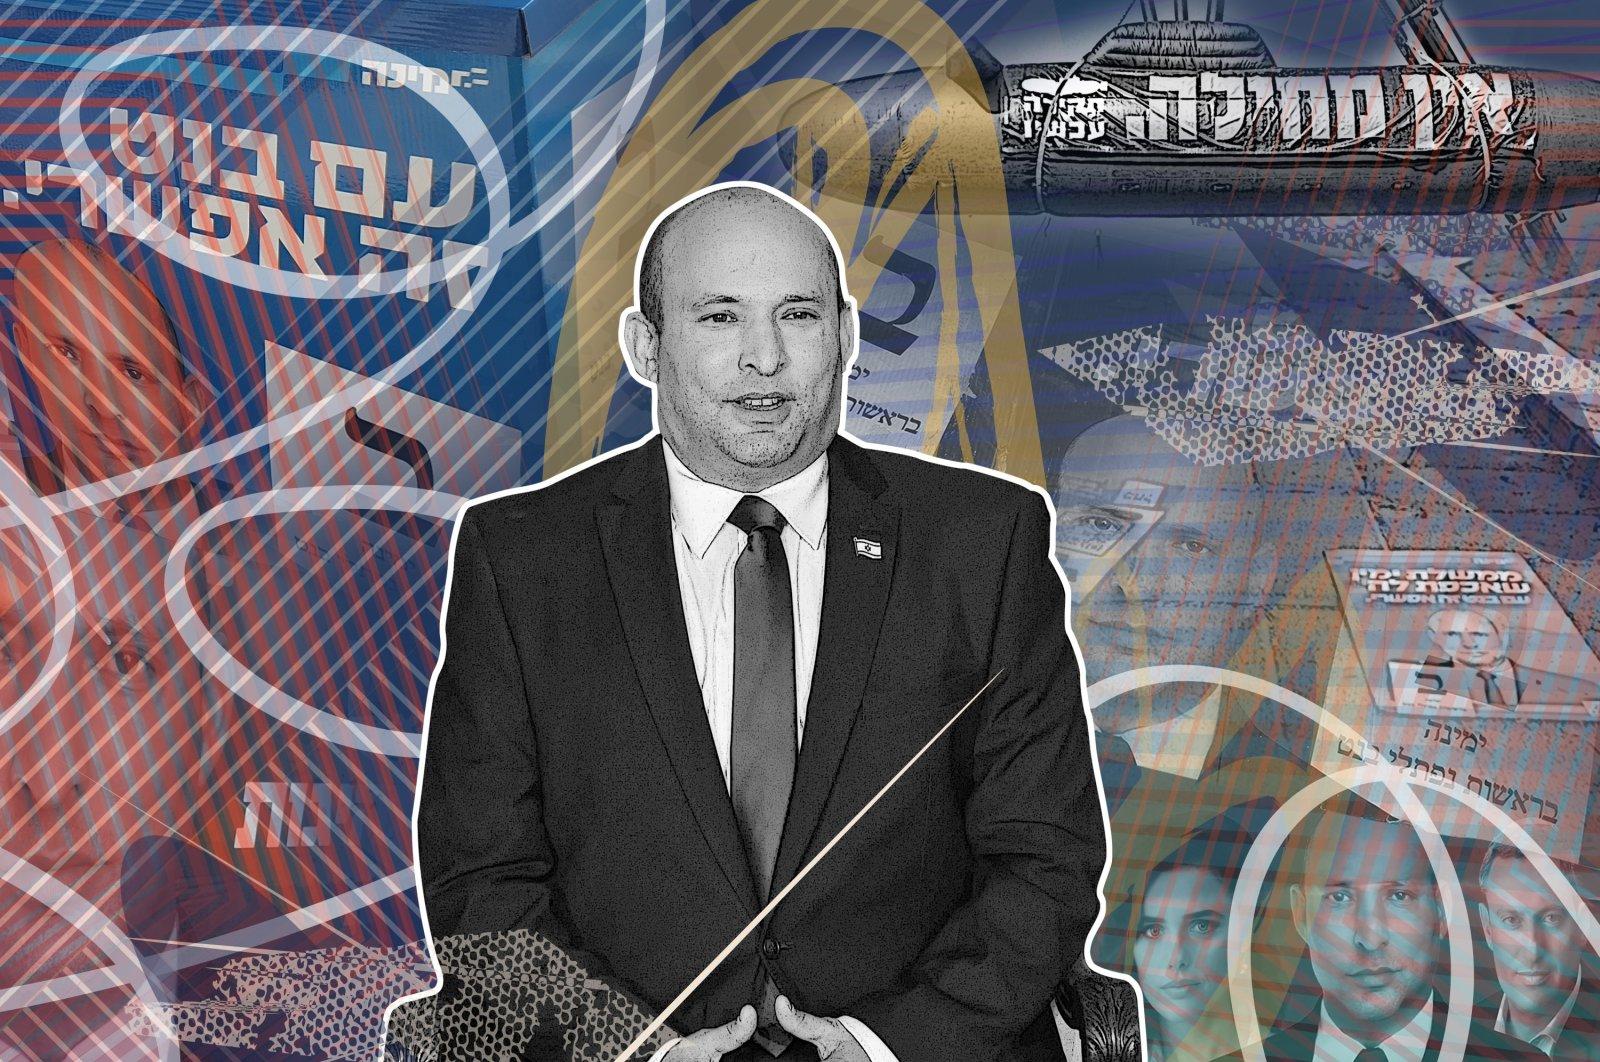 Daily Sabah illustration shows Israel's new Prime Minister Naftali Bennett.